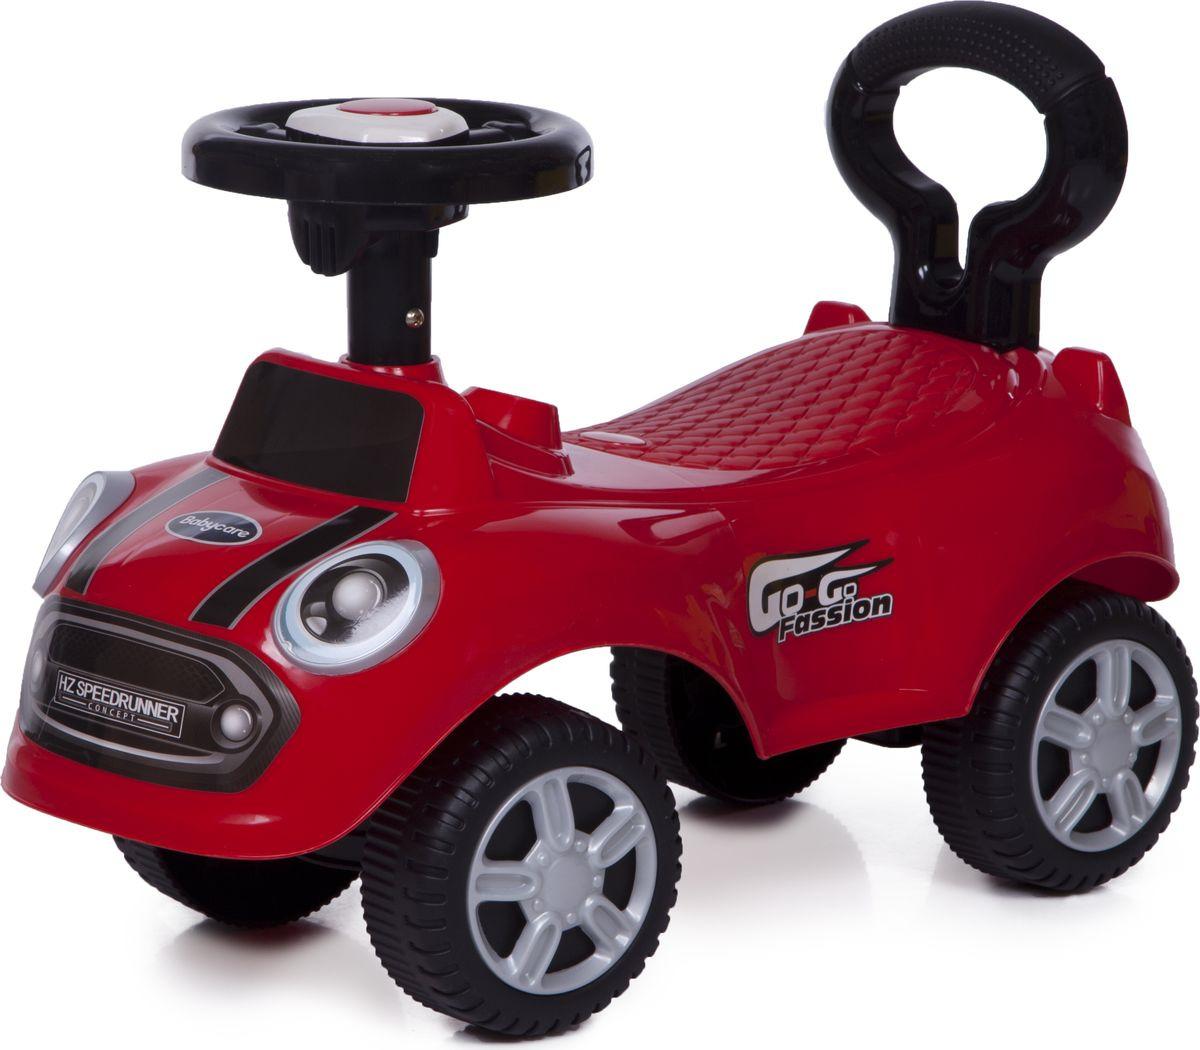 Baby Care Каталка детская Speedrunner цвет красный